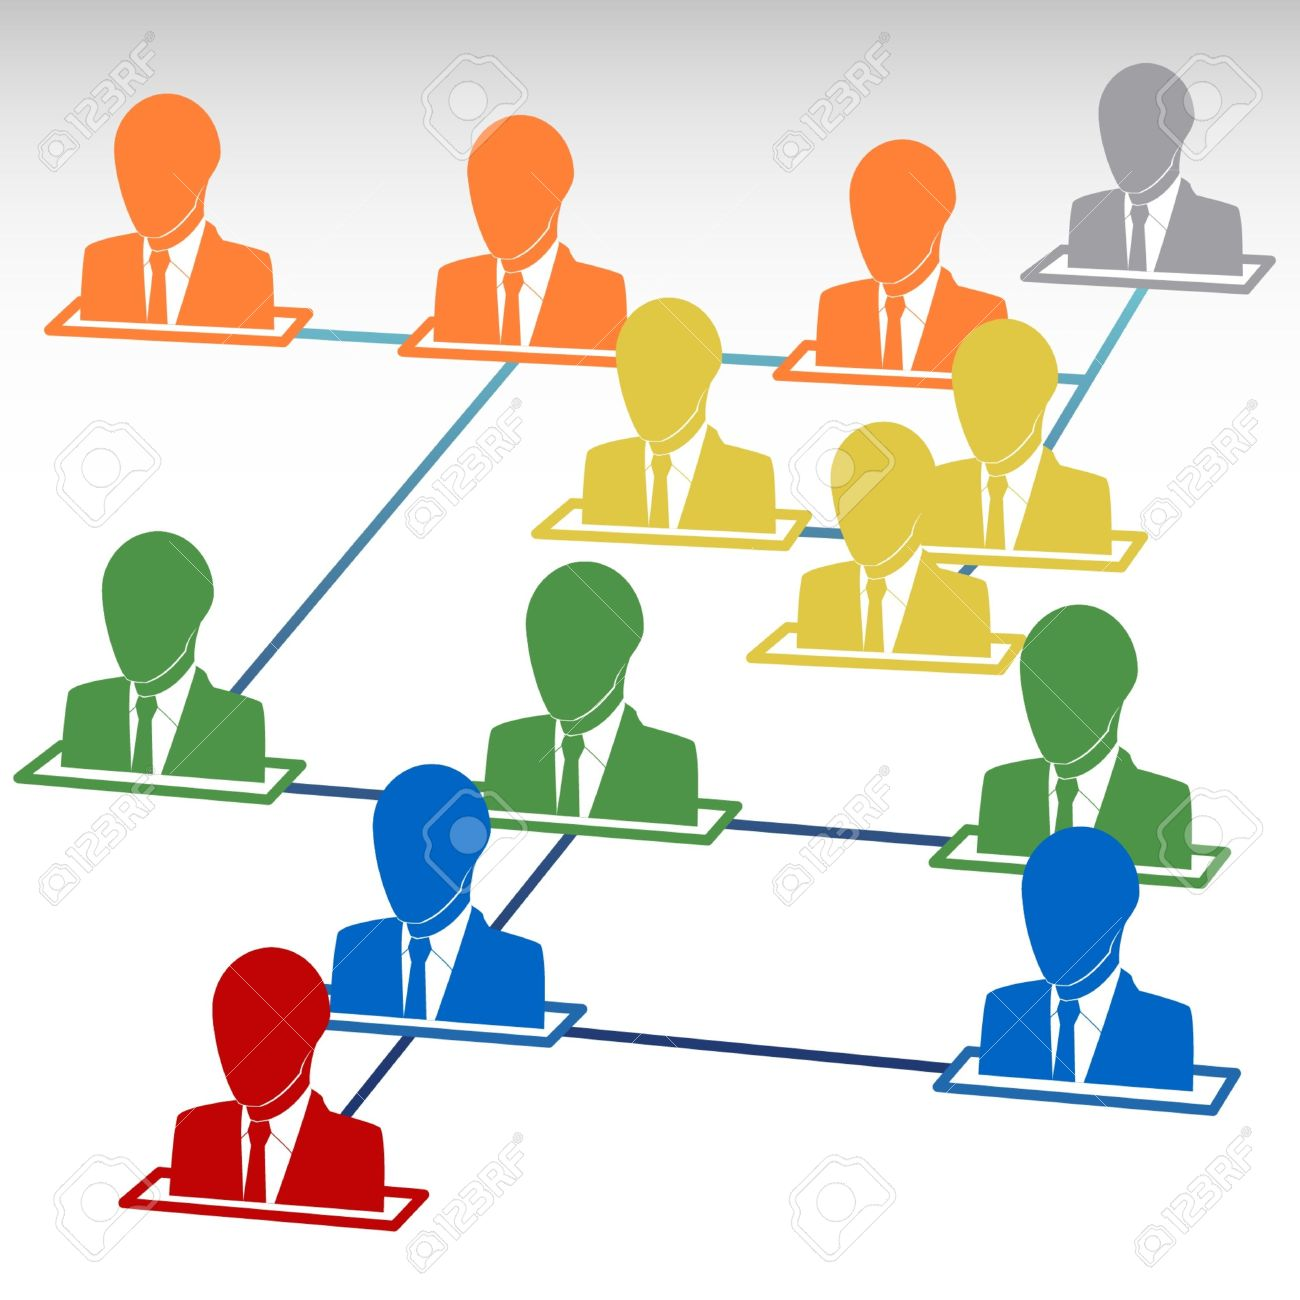 Team Work Icon. Business Team Concept. Friendship Communication.